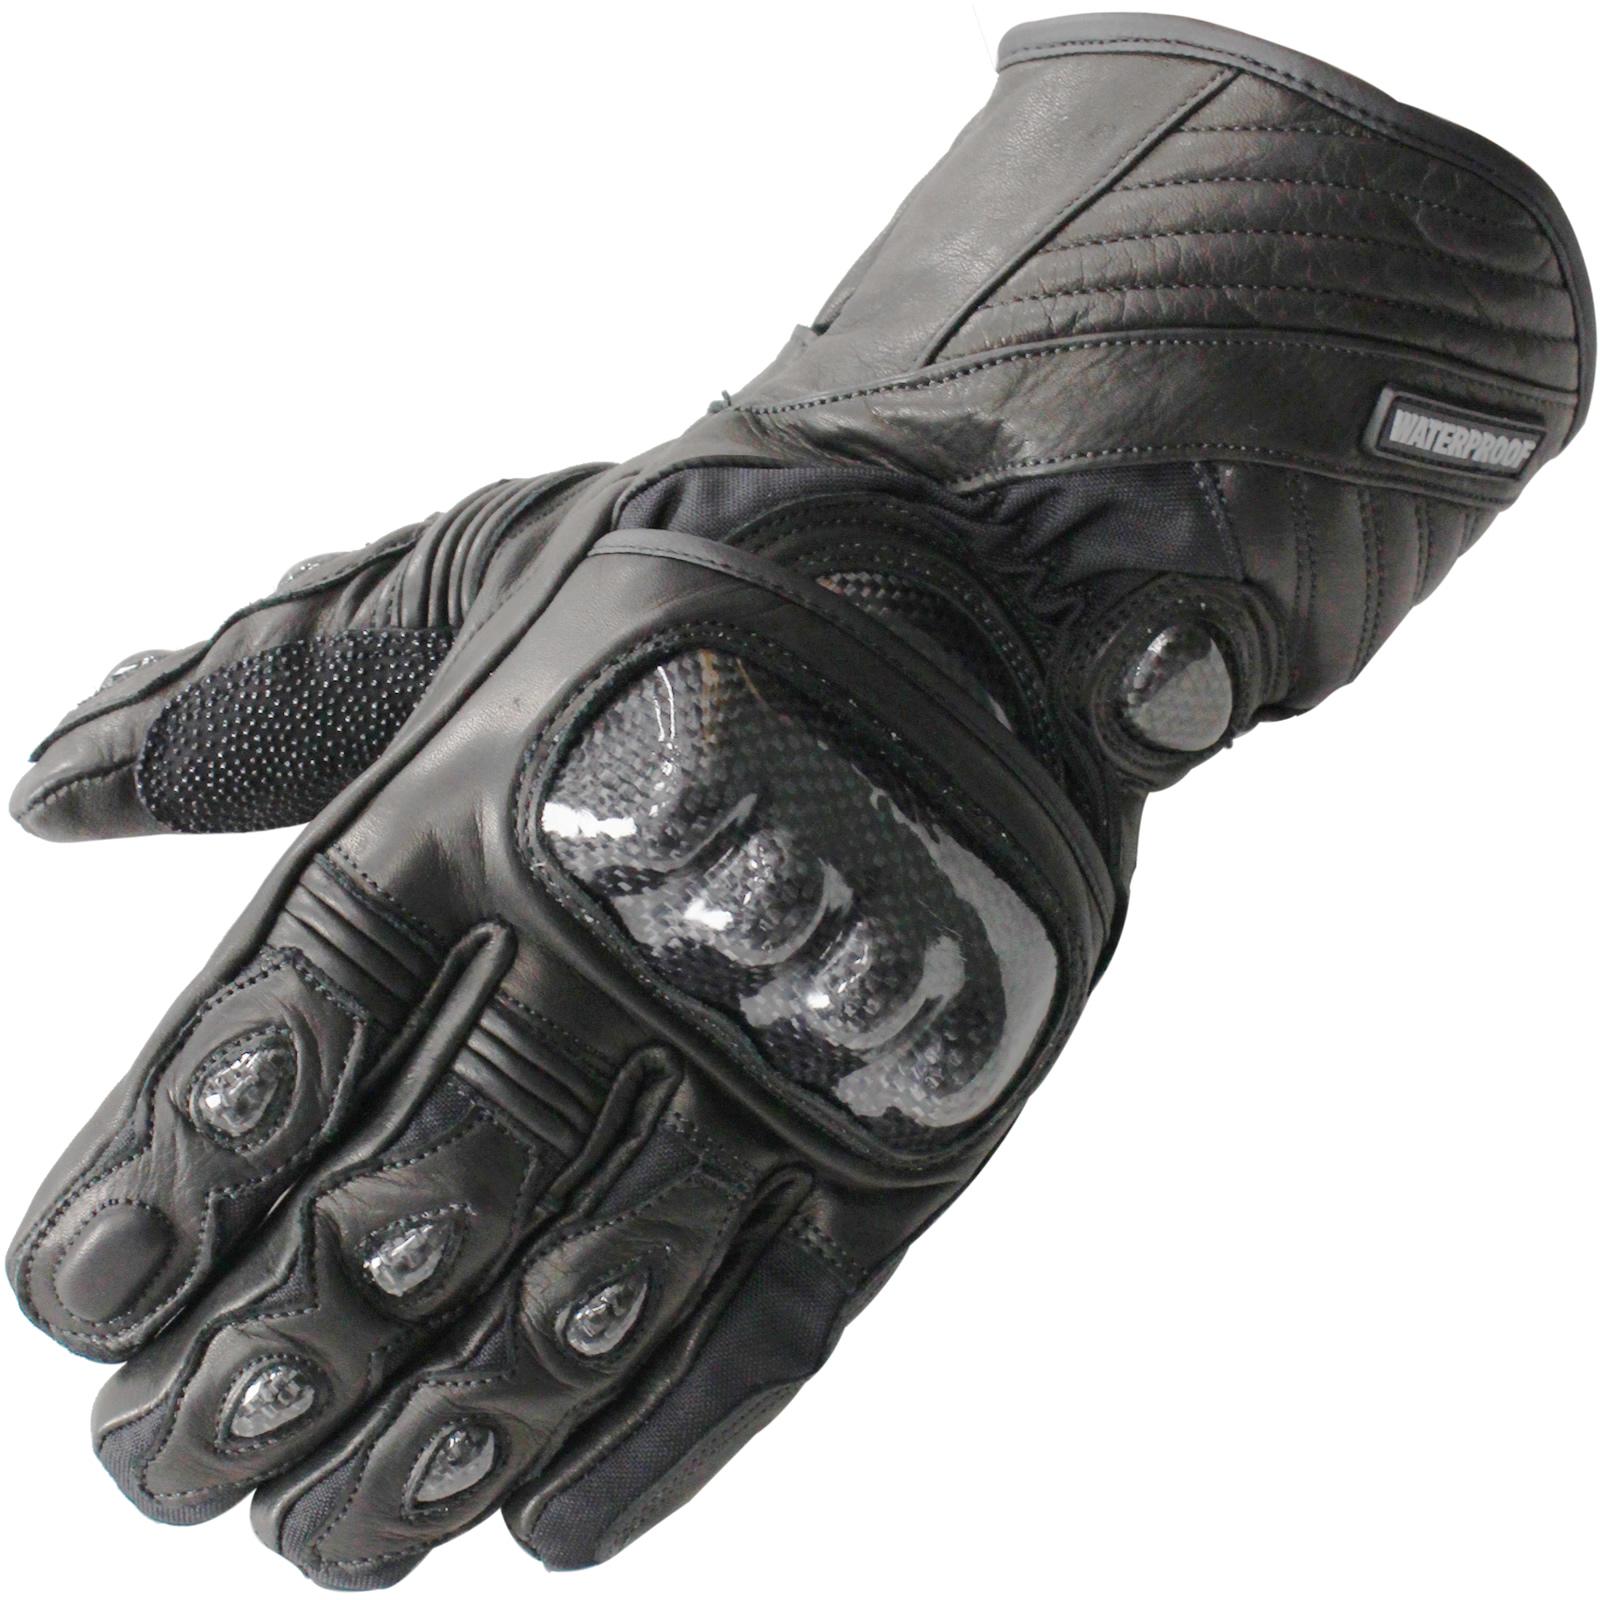 5287-Black-Element-Glove-Black-1600-0